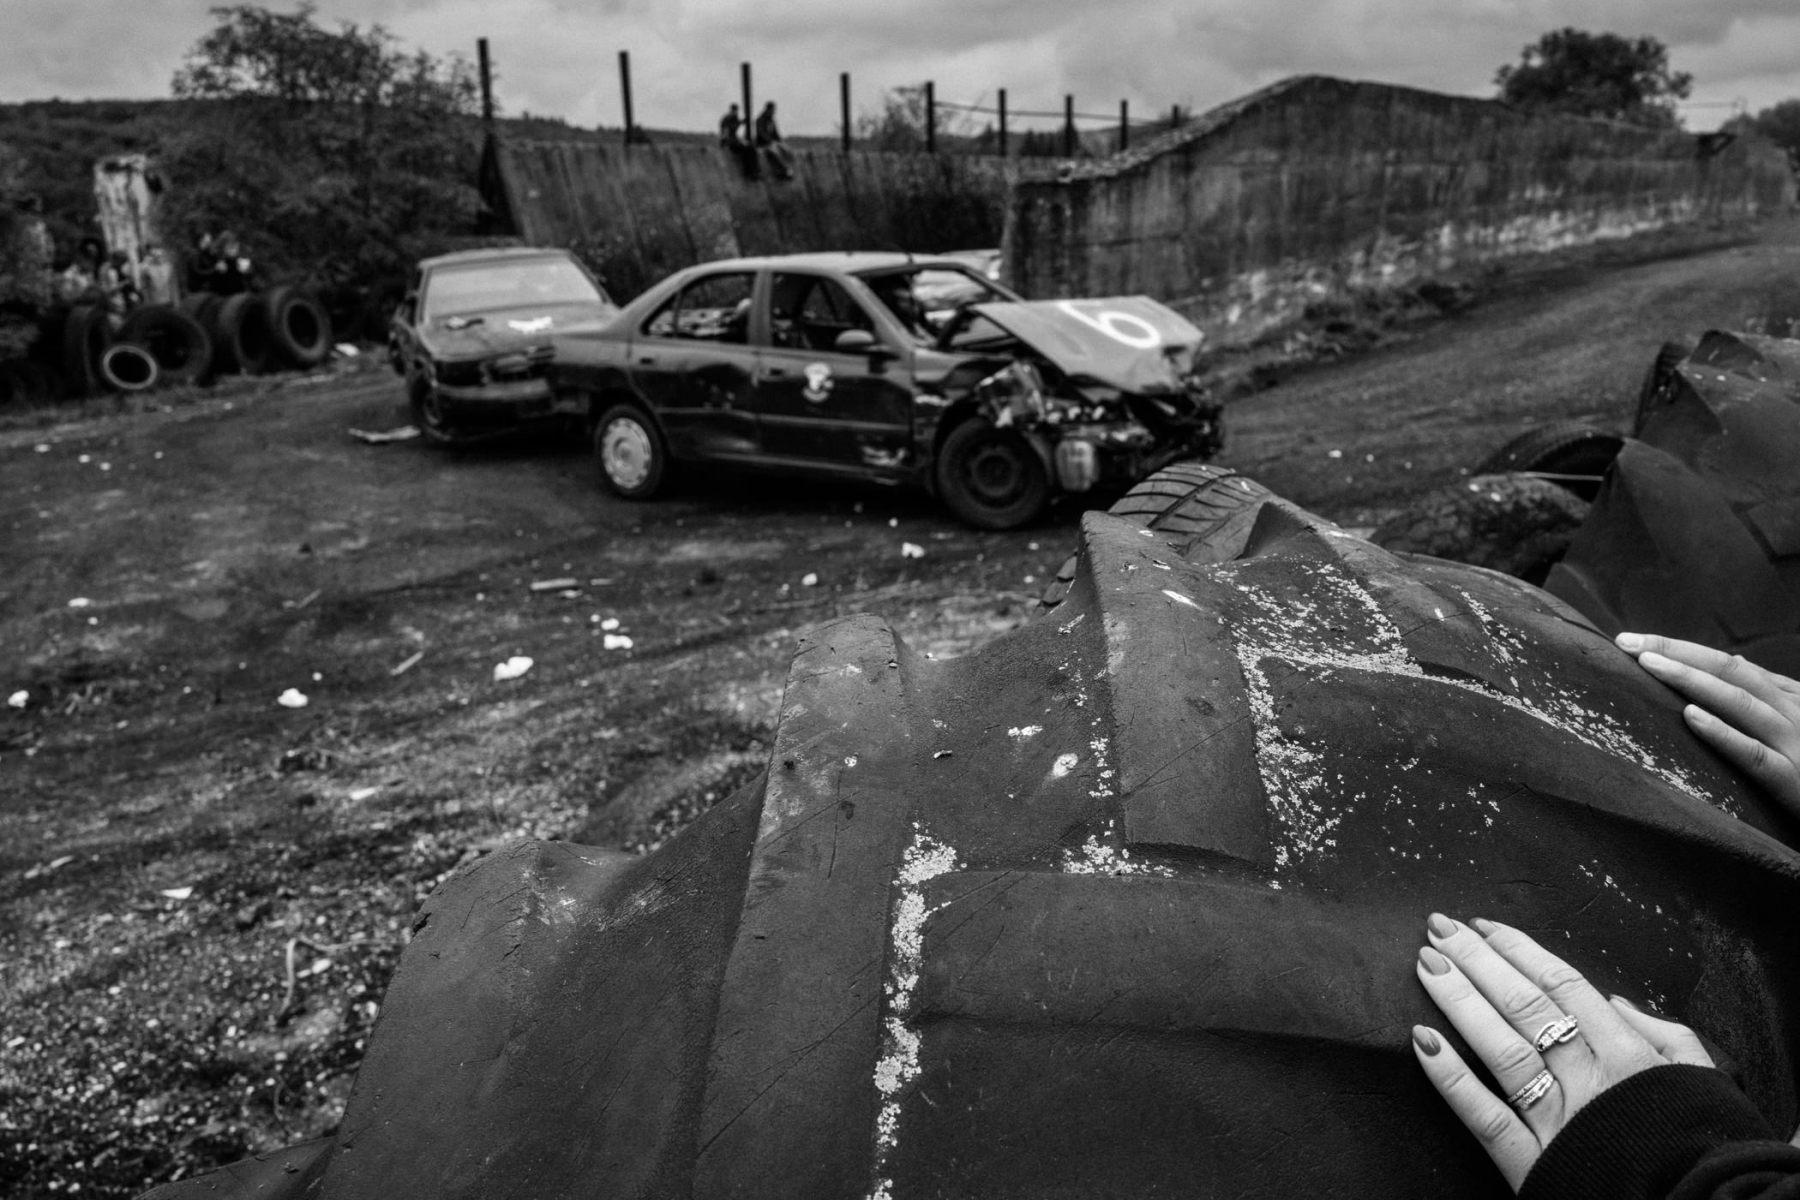 kevin_v_ton_Crash-Cars_04